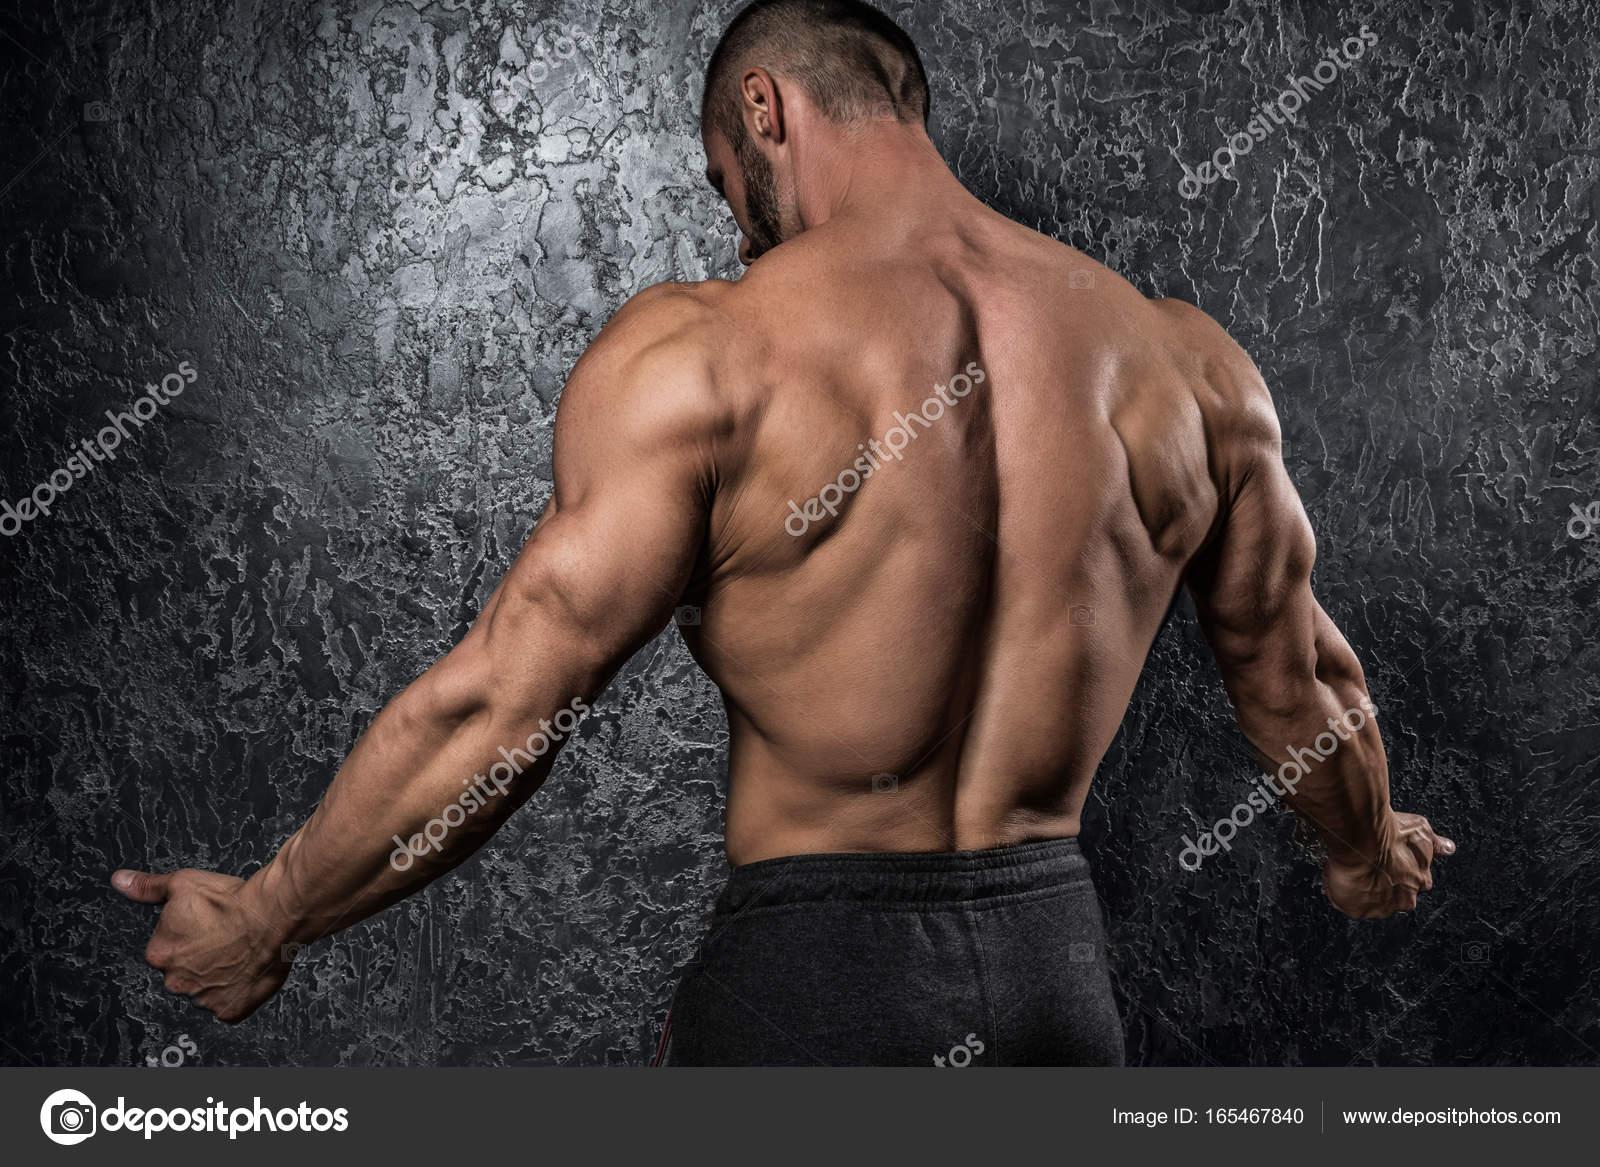 Man showing his muscular back — Stock Photo © AY_PHOTO #165467840